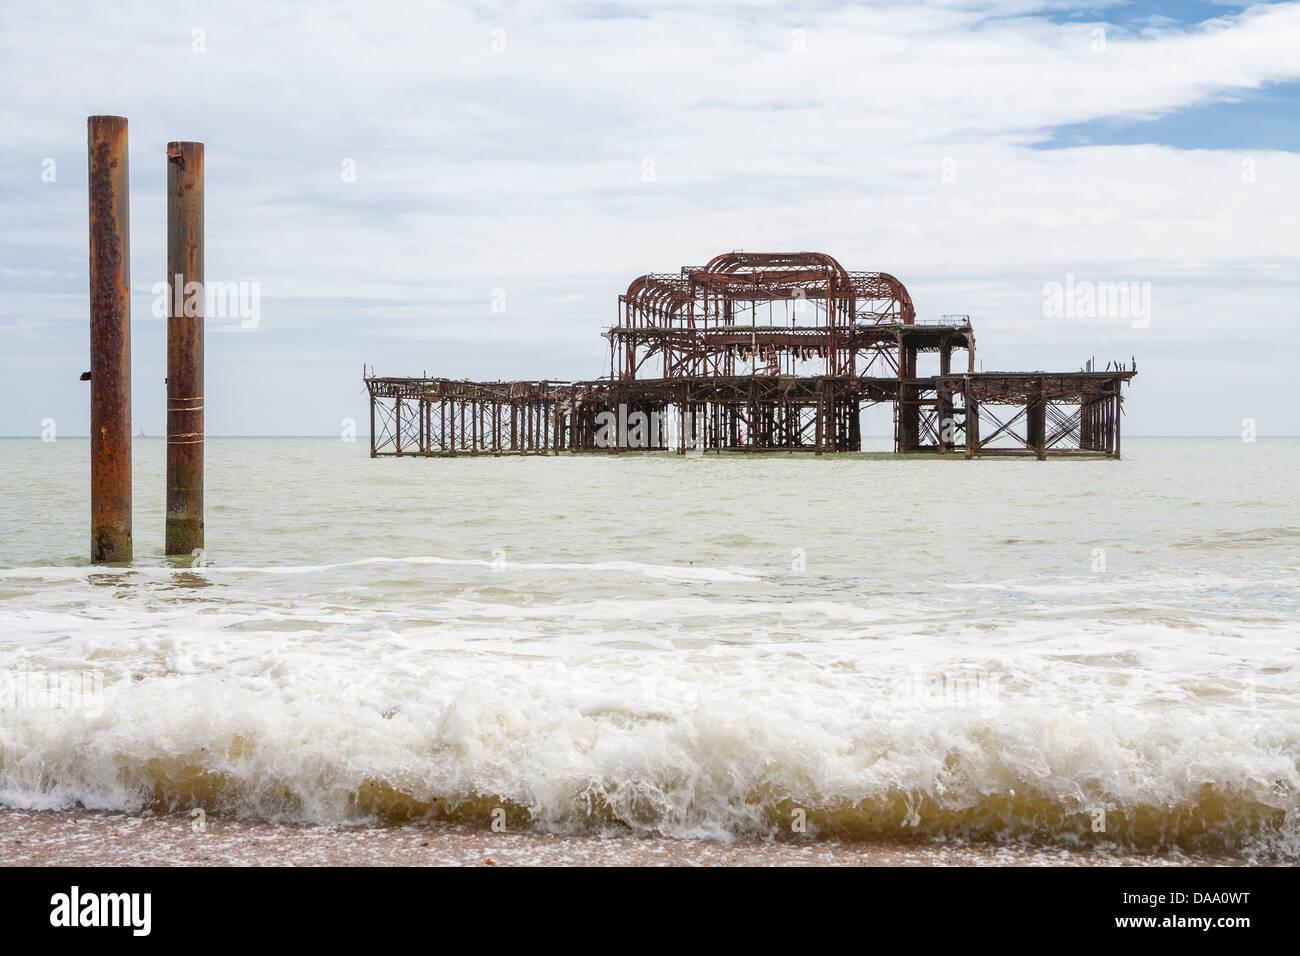 Old West Pier. Brighton, UK - Stock Image